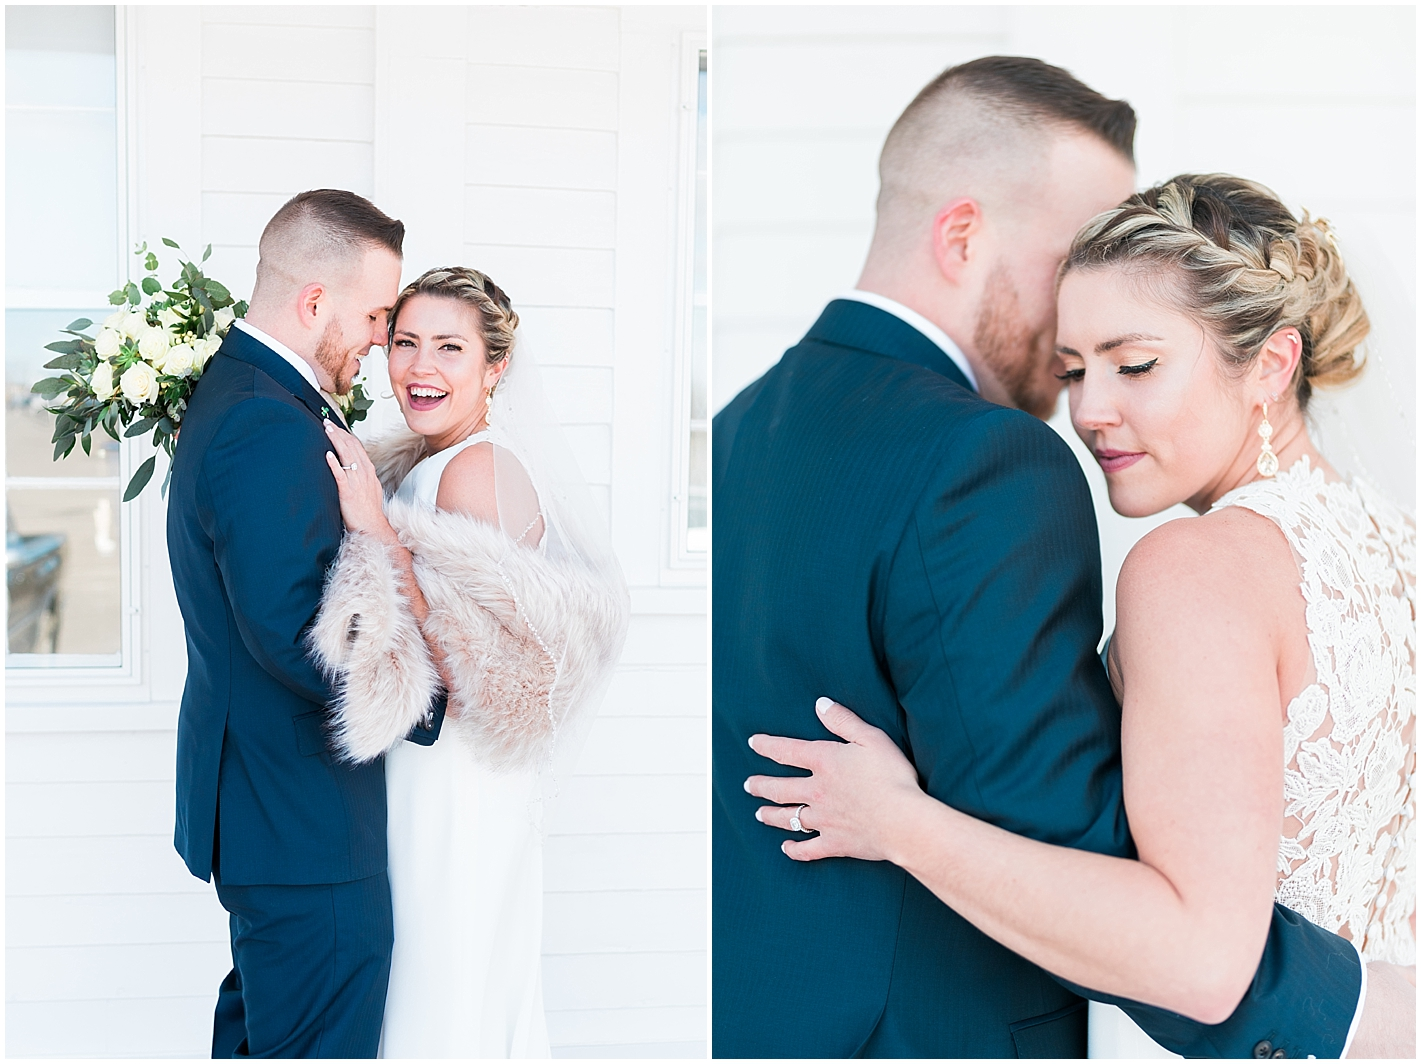 Timeless Wedding Portraits Photos by Alyssa Parker Photography